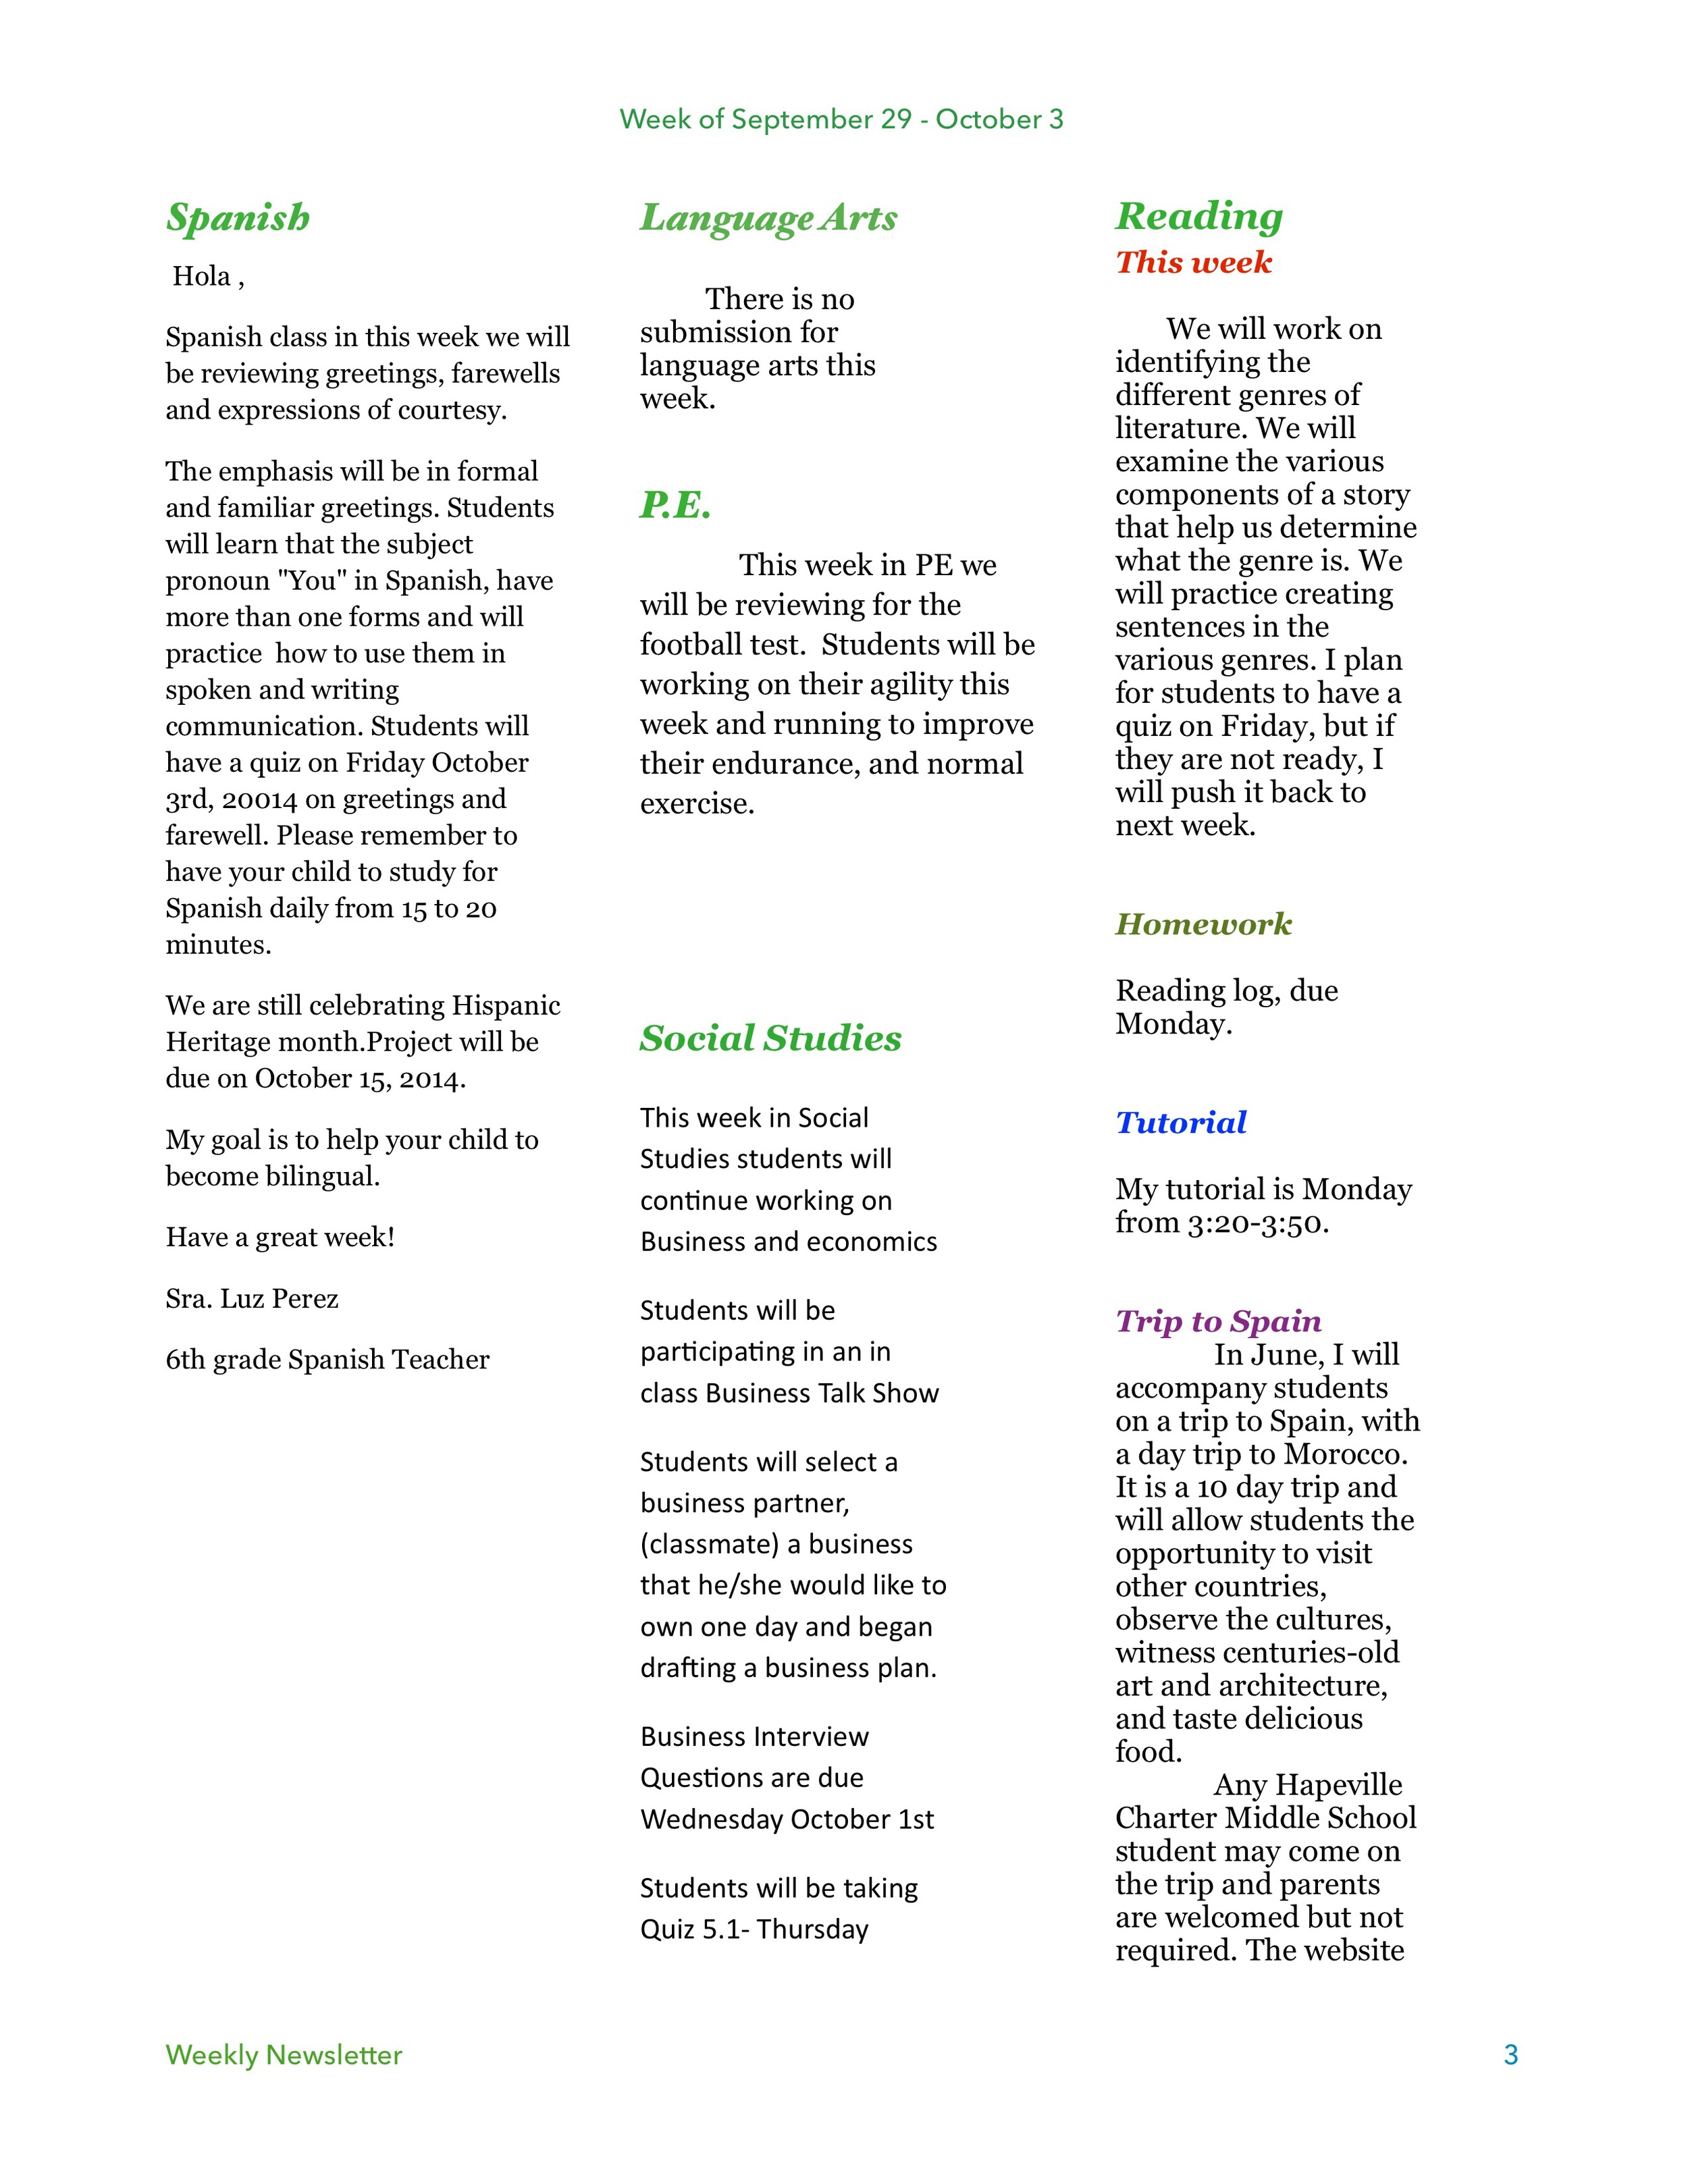 Newsletter Image6th grade 9-29 3.jpeg